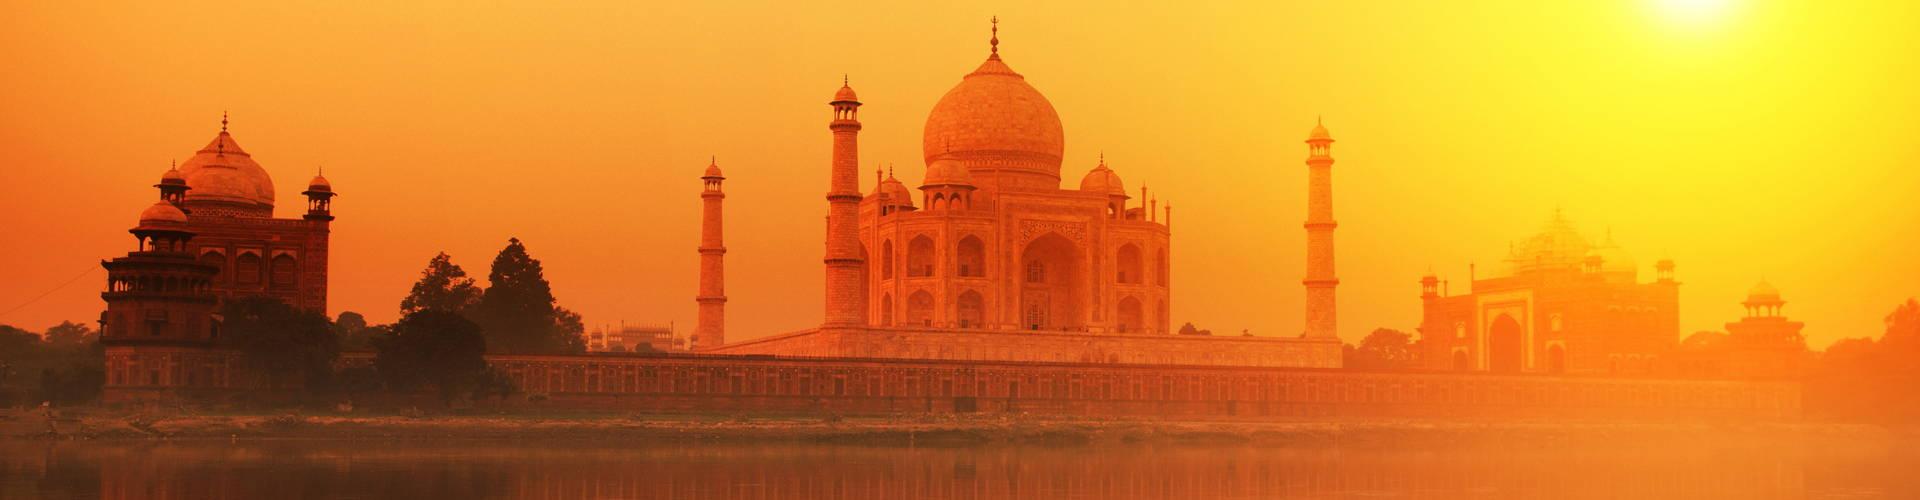 india incense culture